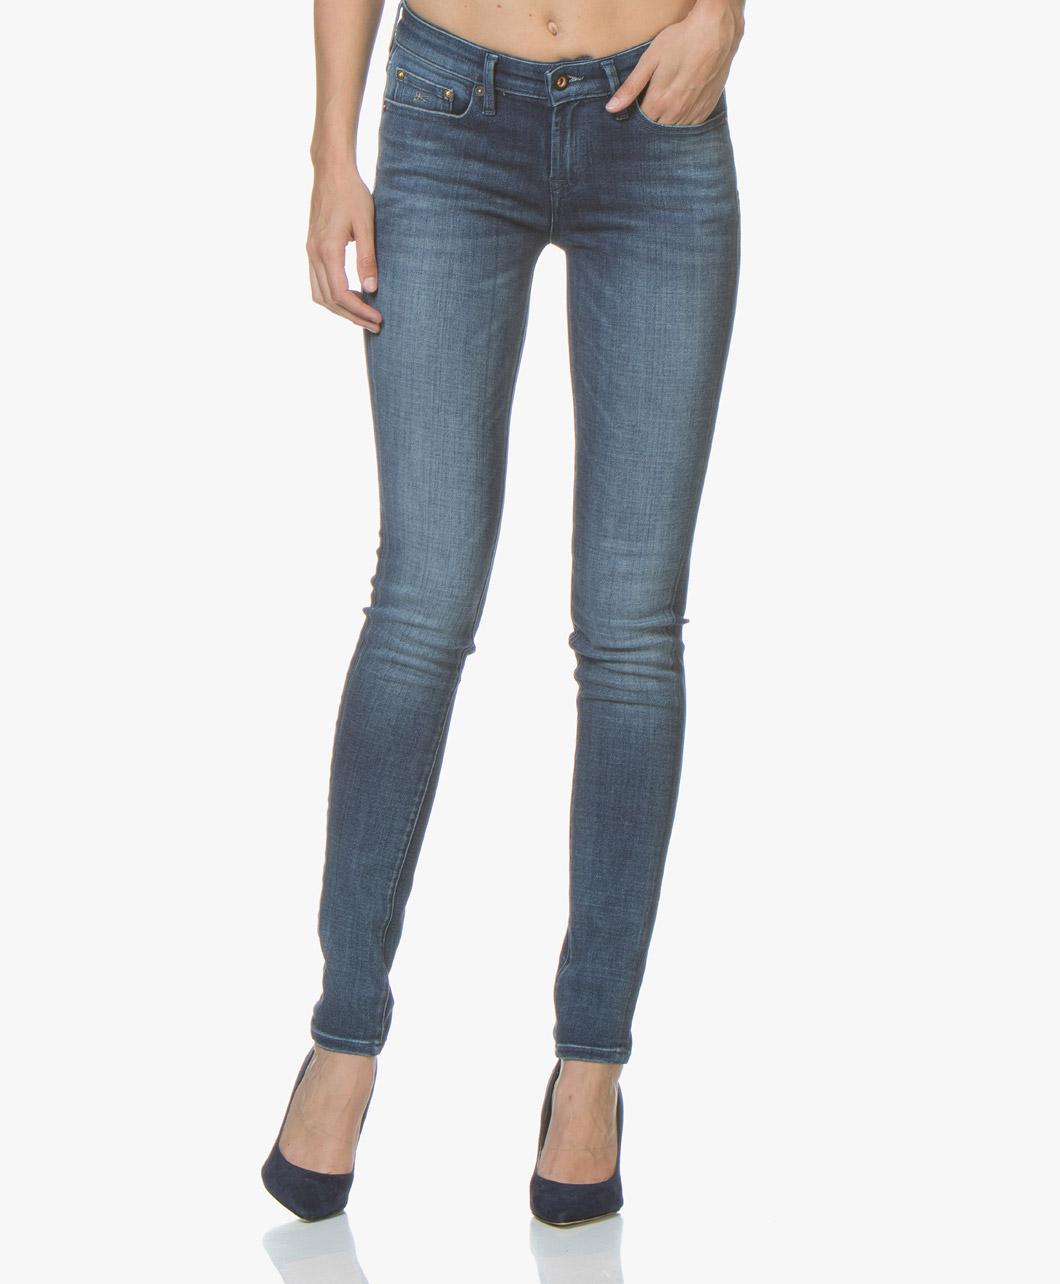 Afbeelding van Denham Jeans Blauw Sharp Skinny Fit